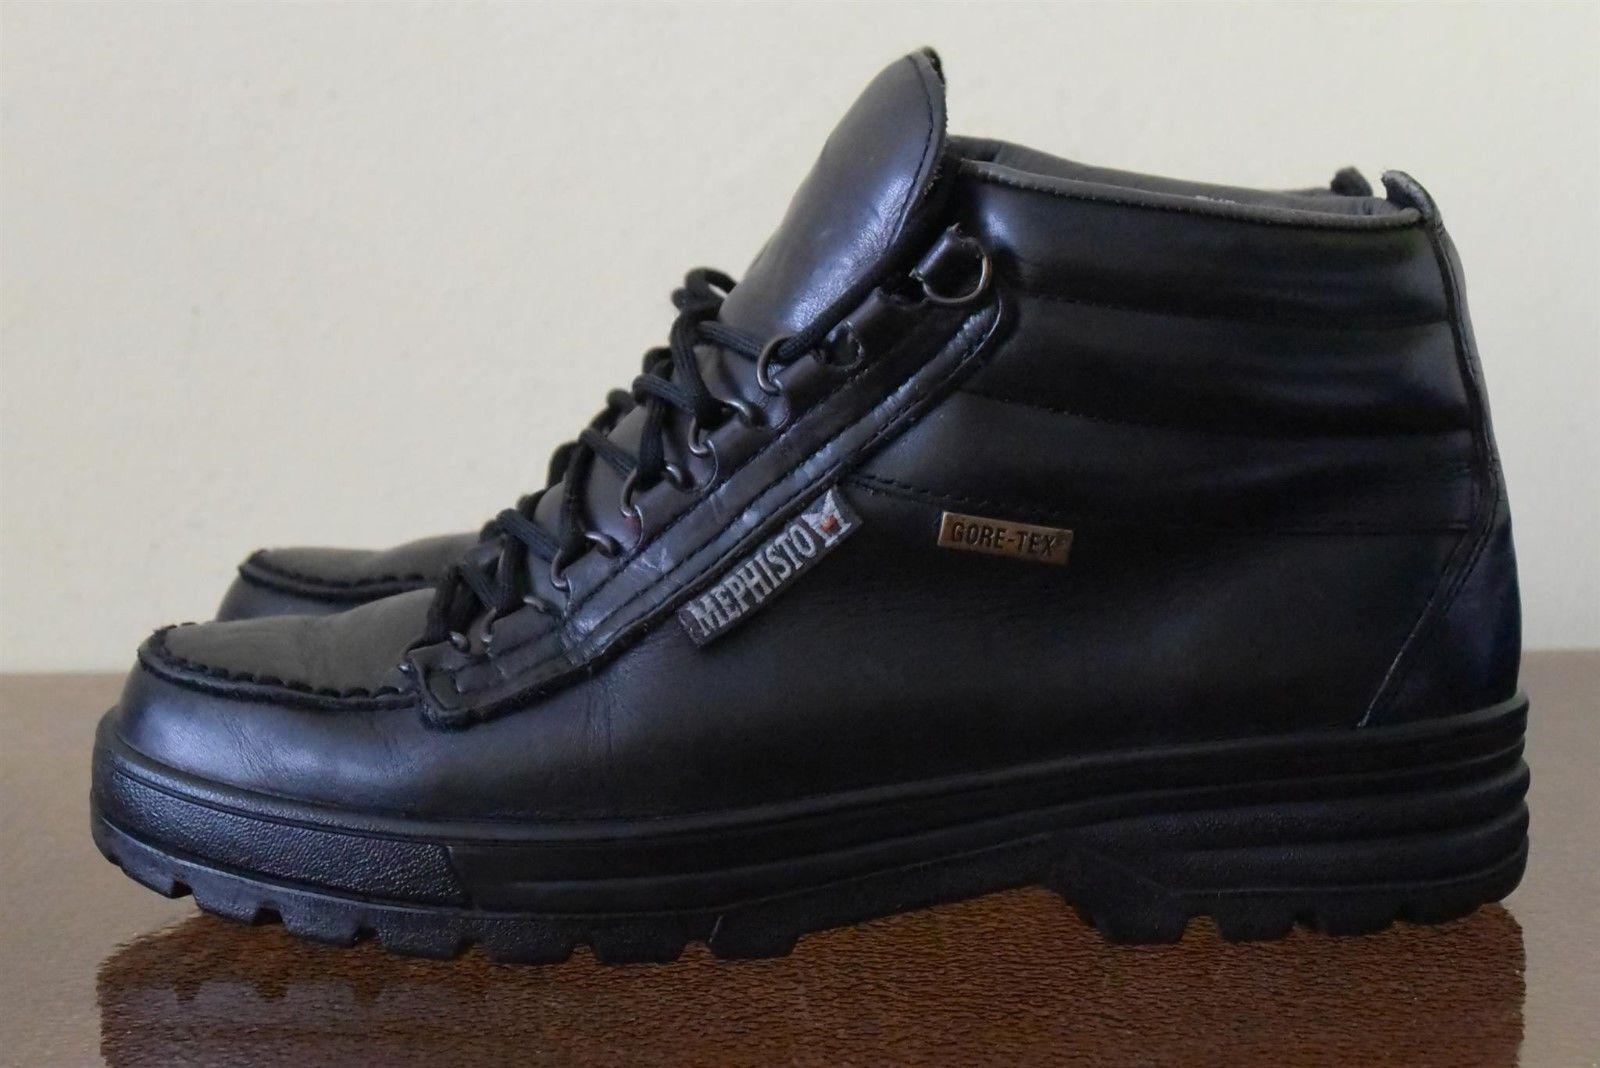 Mephisto Gore-tex Black Leather Waterproof Boots Sz 8